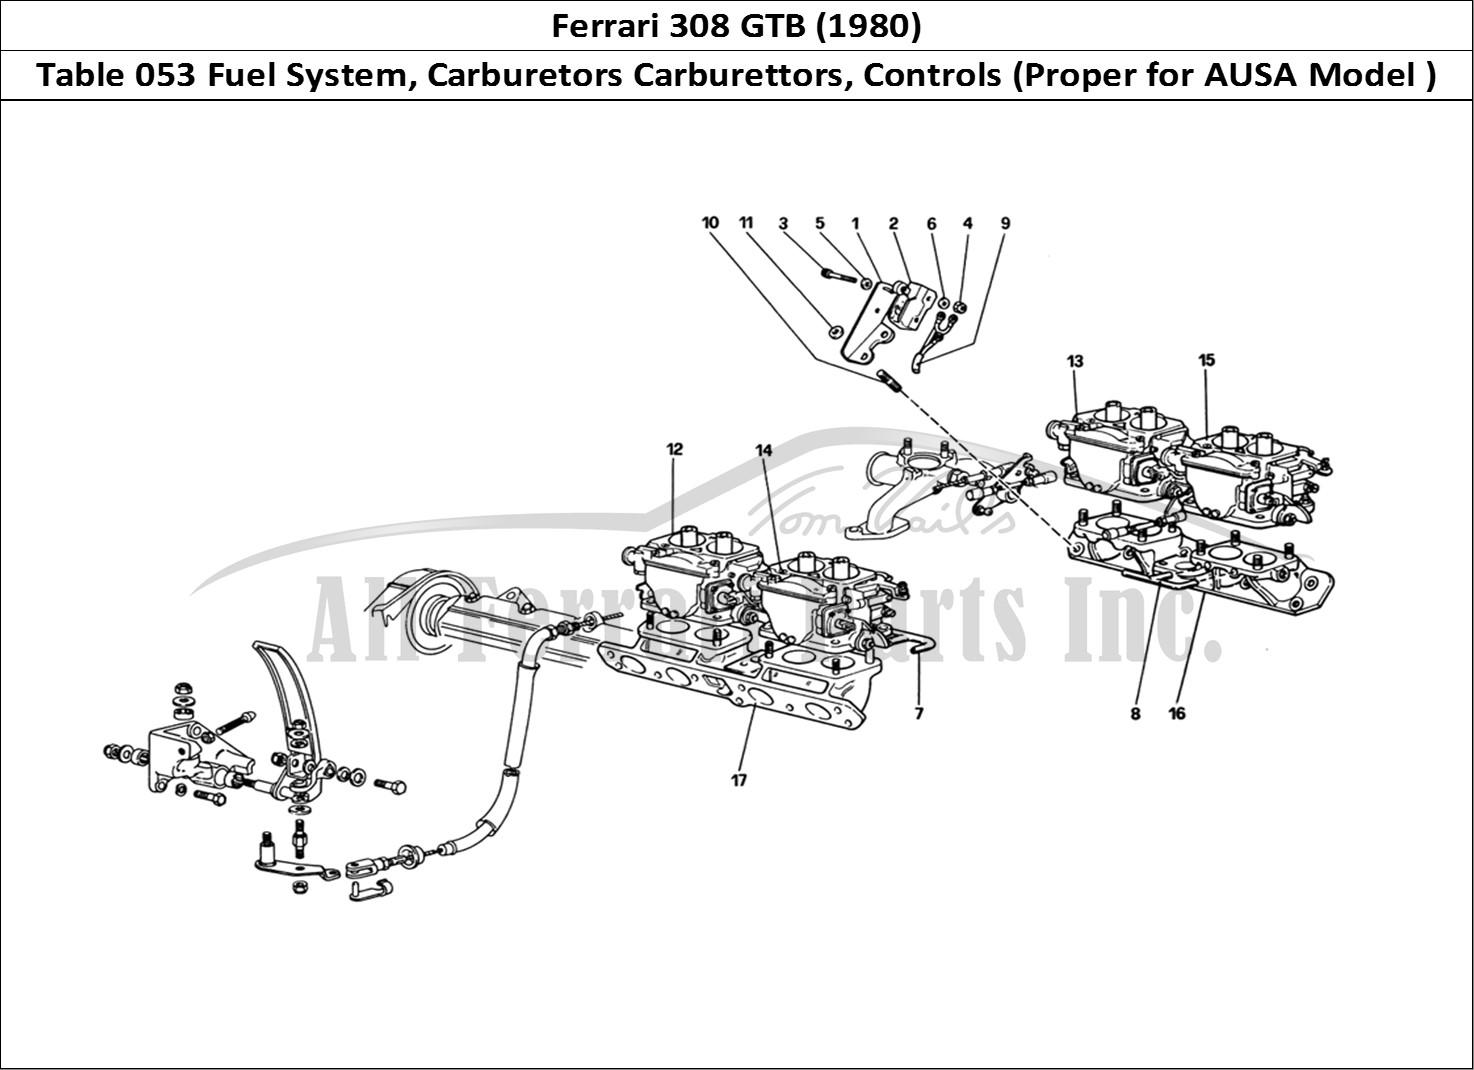 Buy original Ferrari 308 GTB (1980) 053 Fuel System